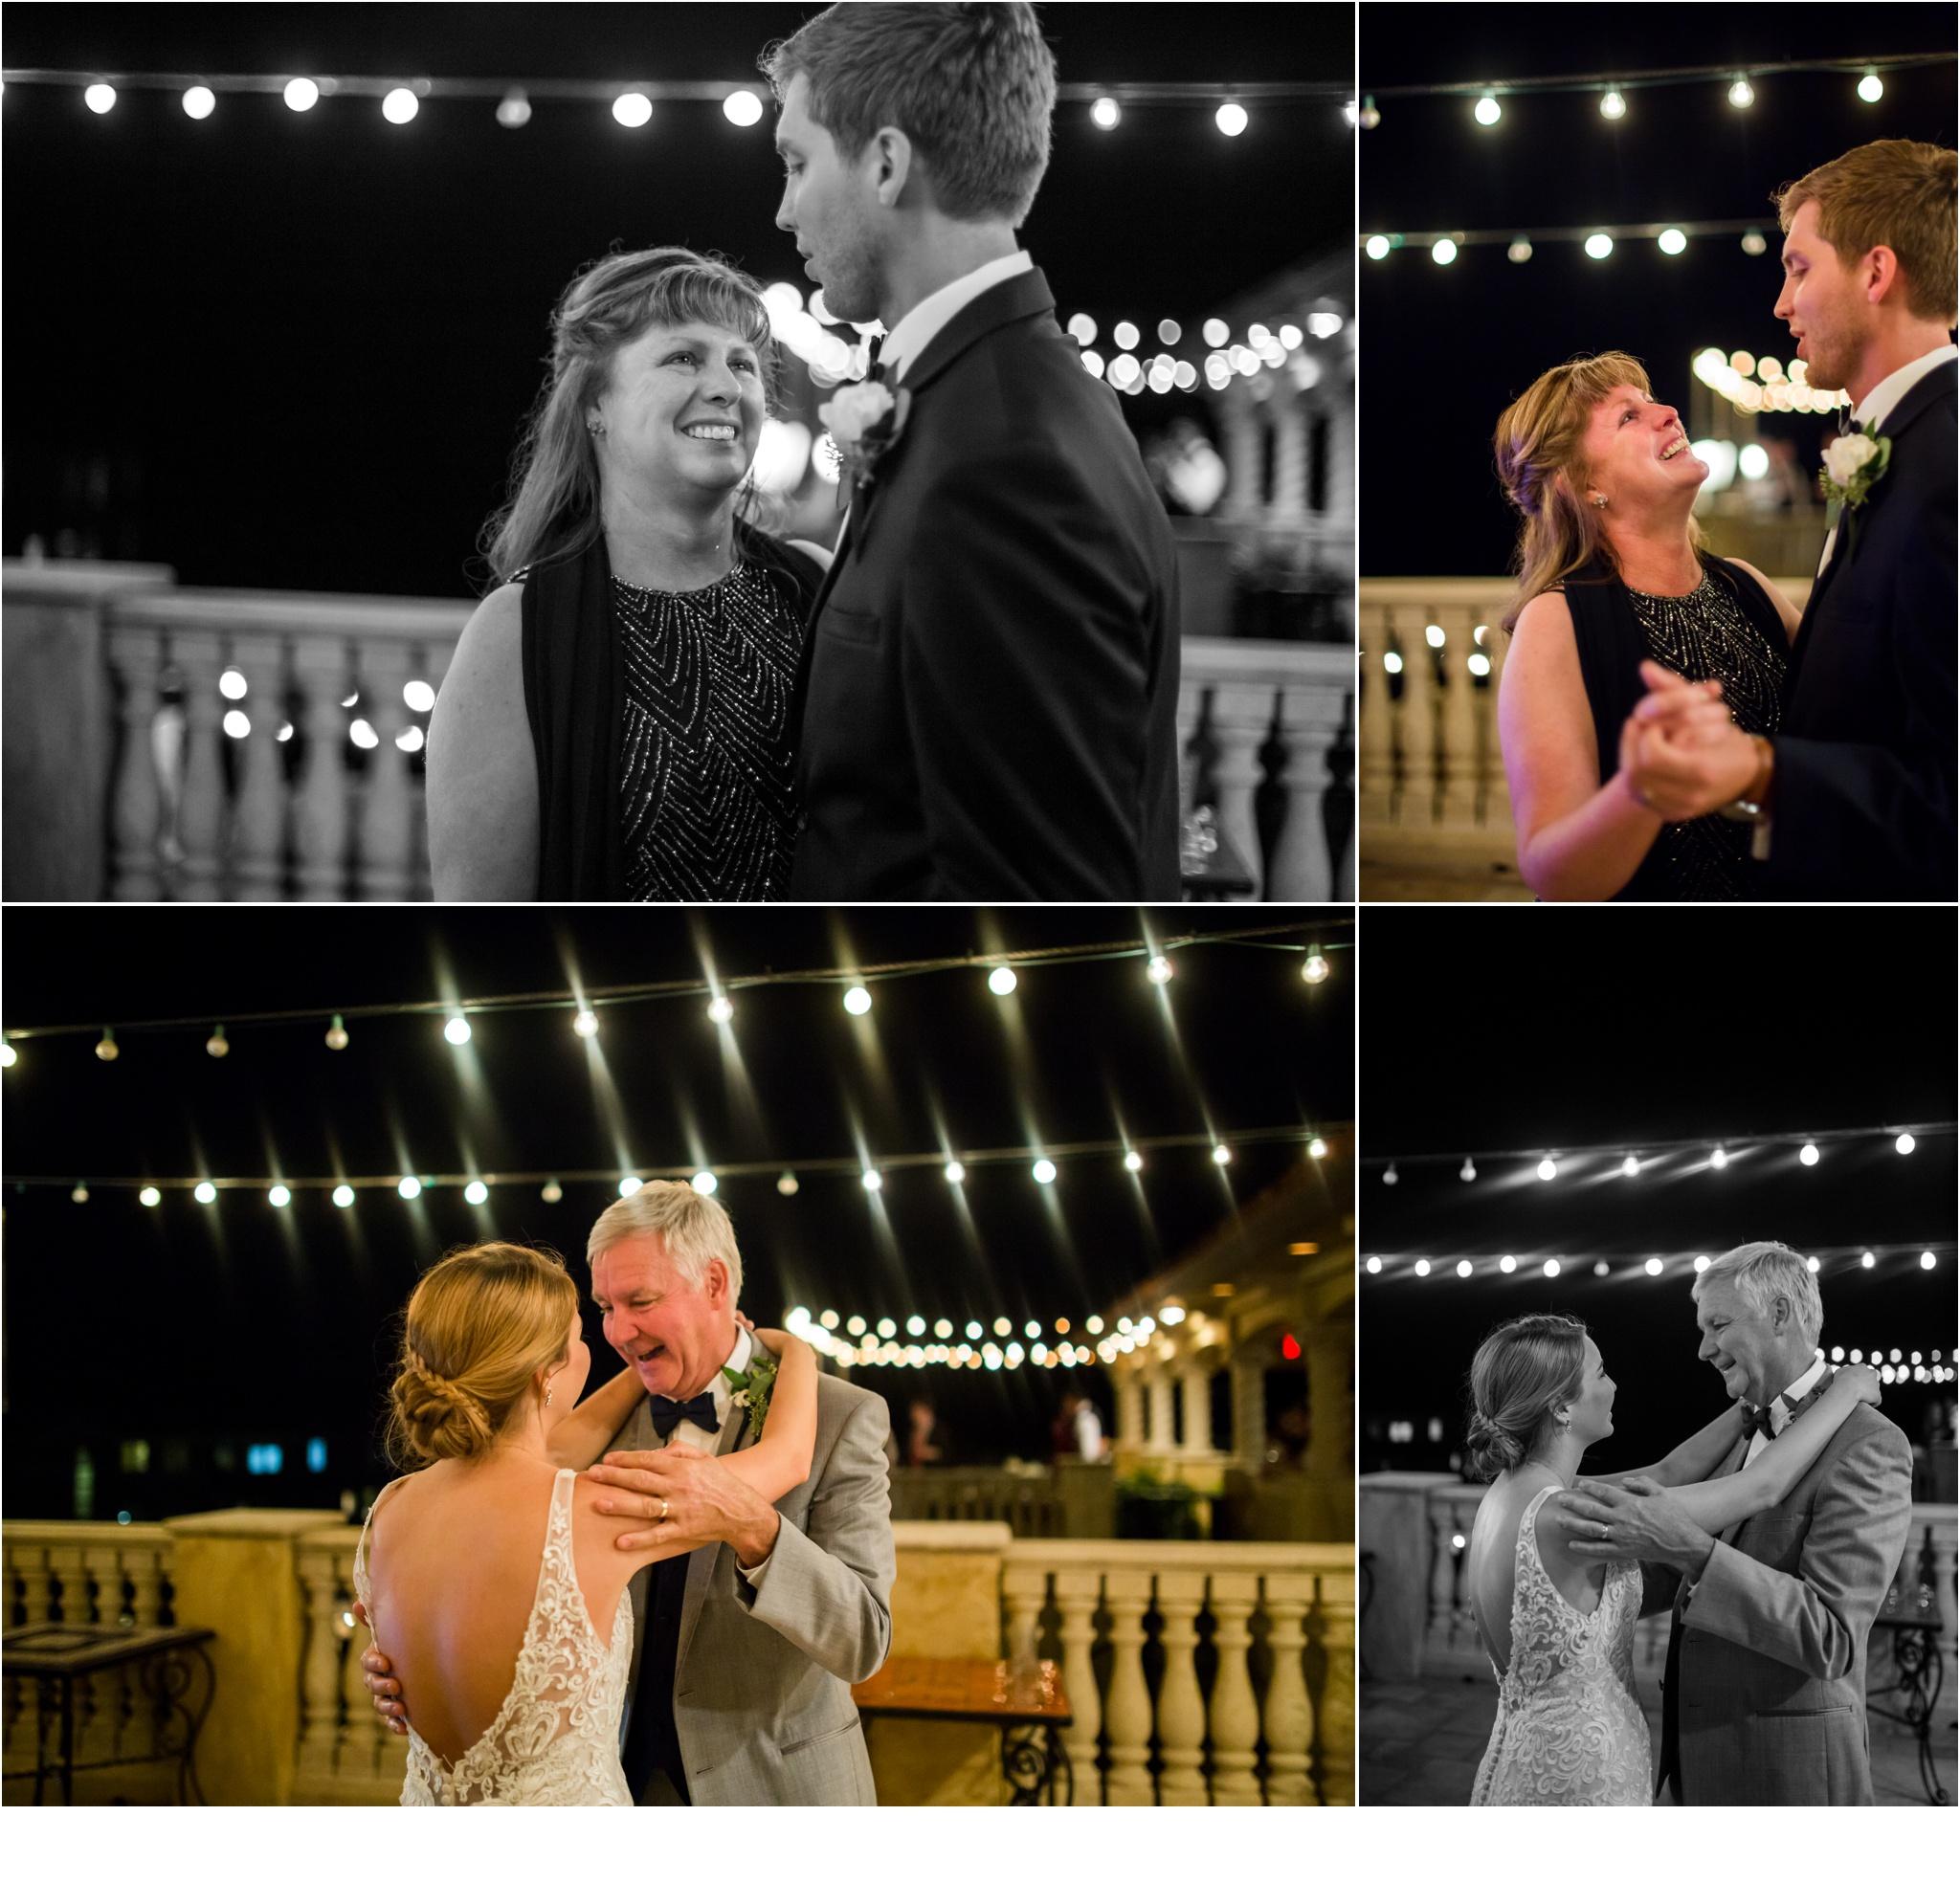 Rainey_Gregg_Photography_St._Simons_Island_Georgia_California_Wedding_Portrait_Photography_0698.jpg